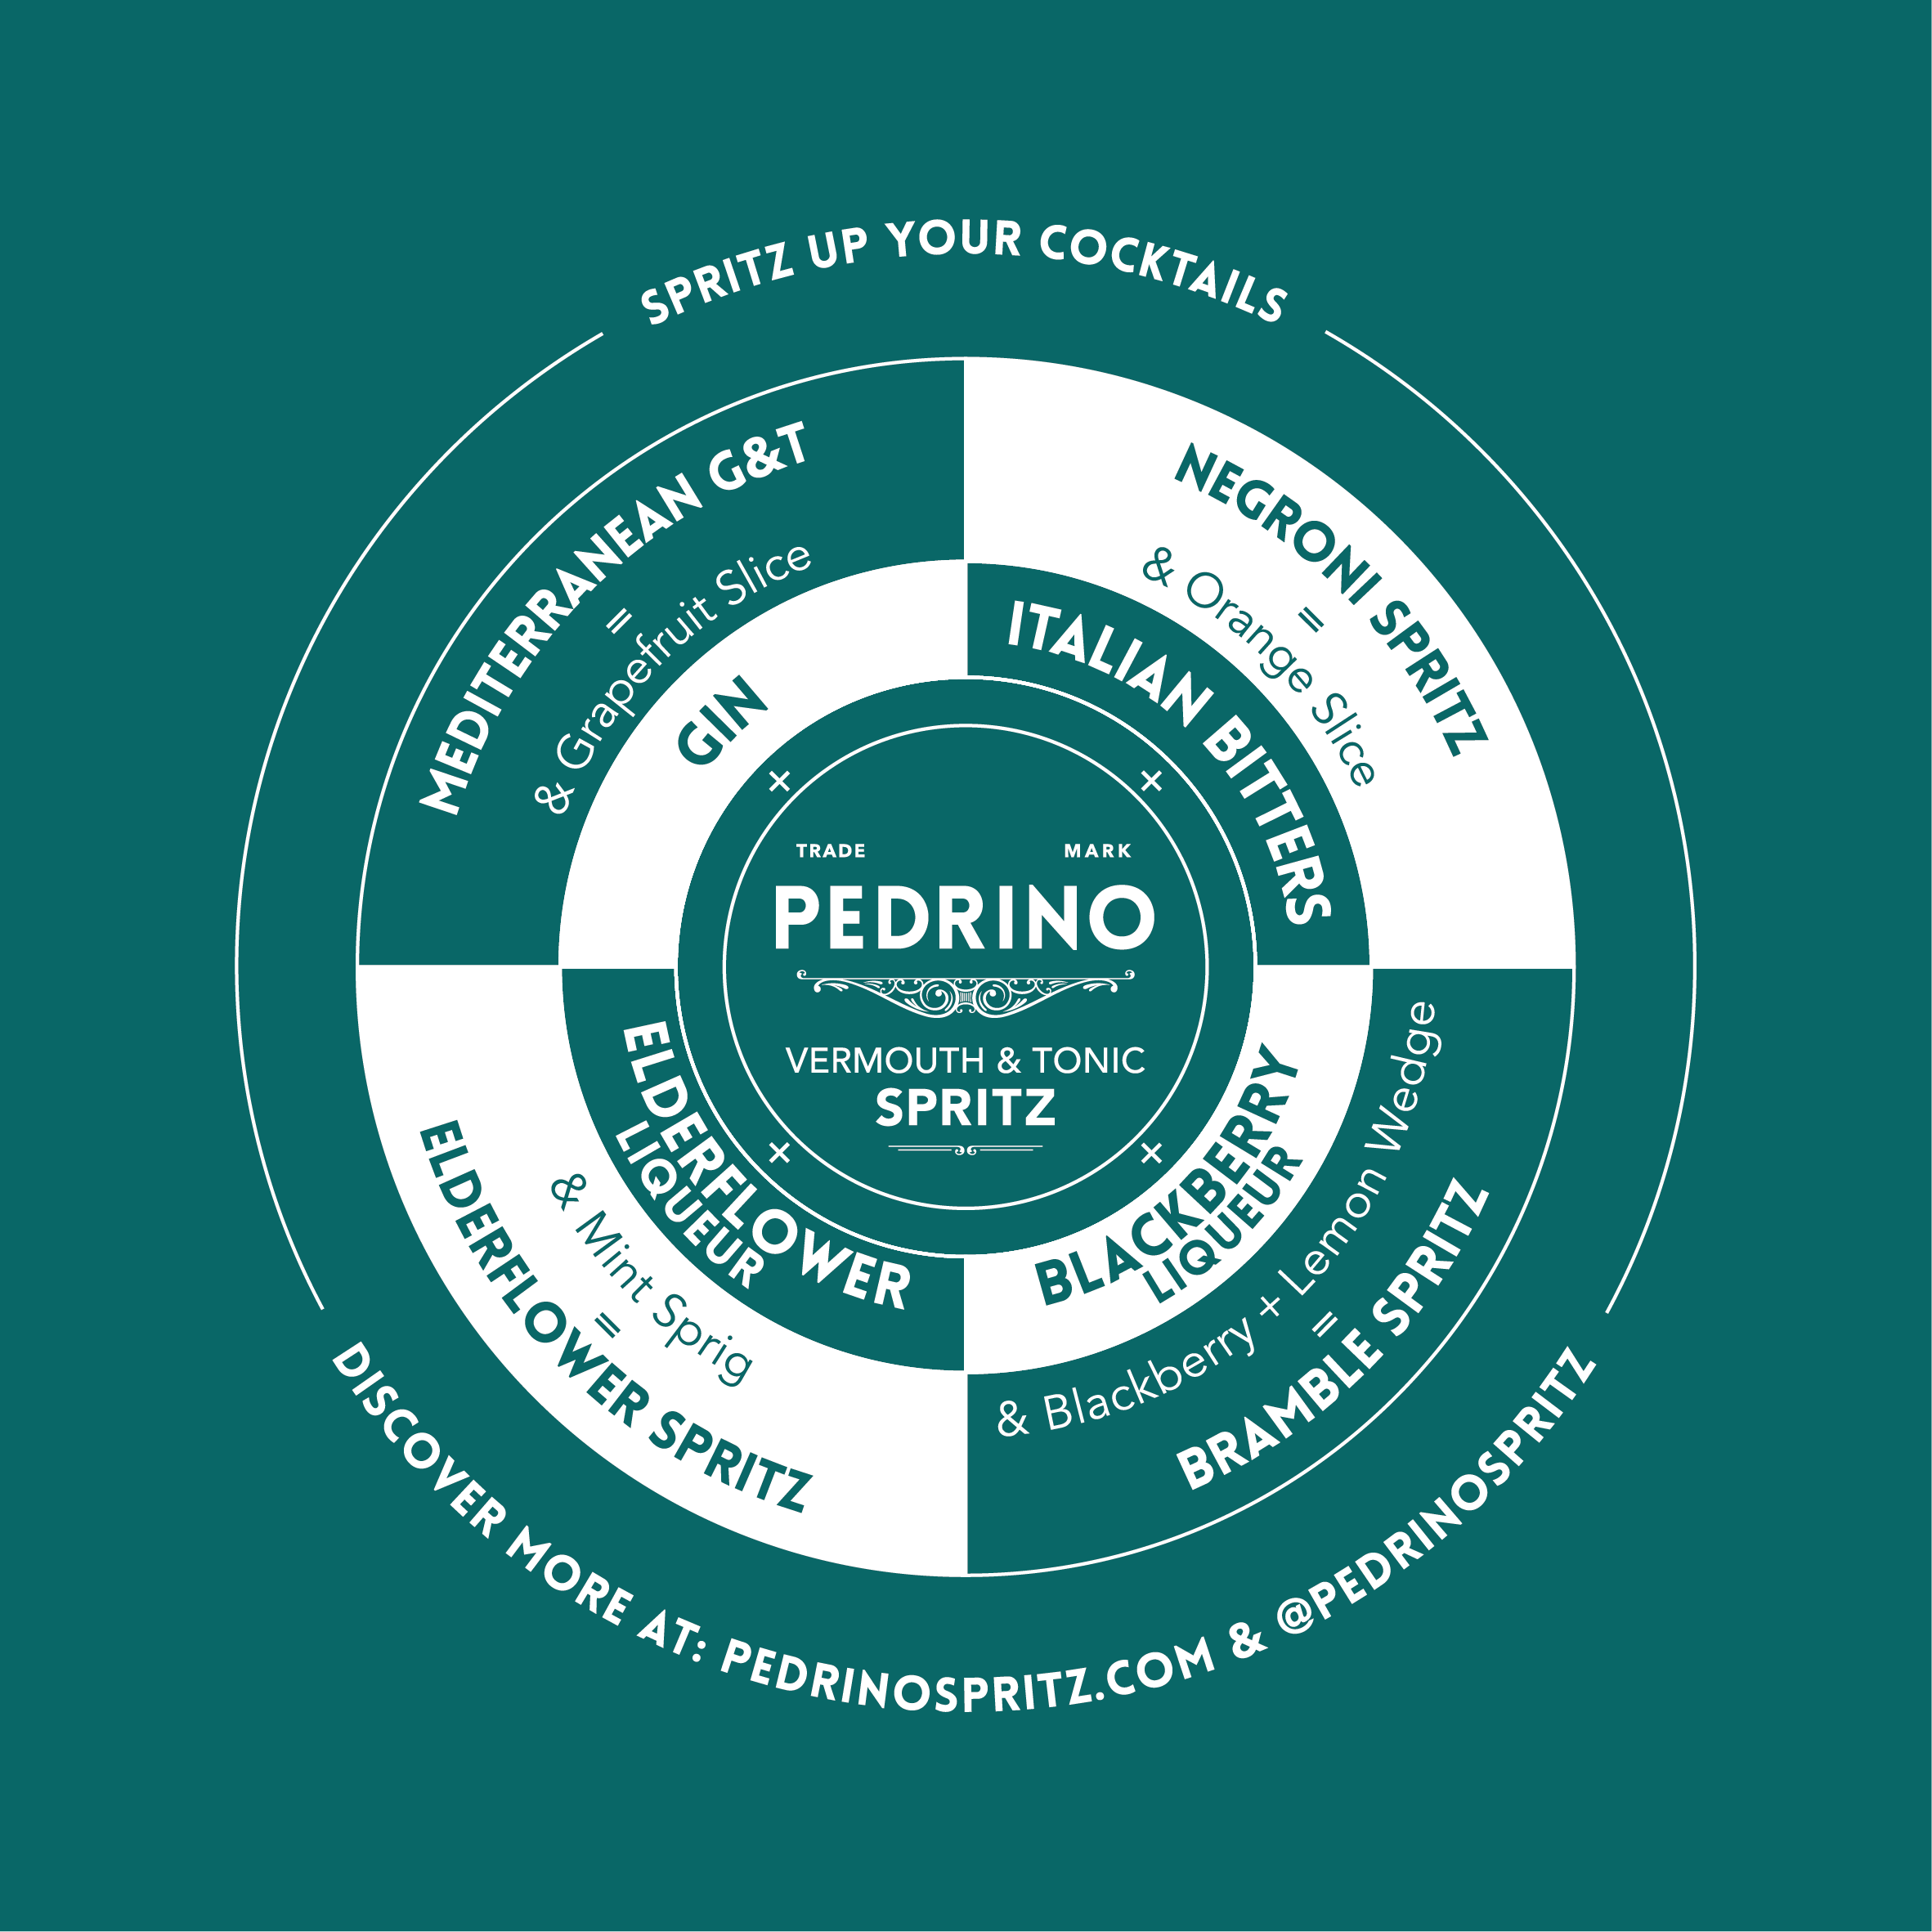 Pedrino VErmouth & Tonic Spritz. Pairing Wheel